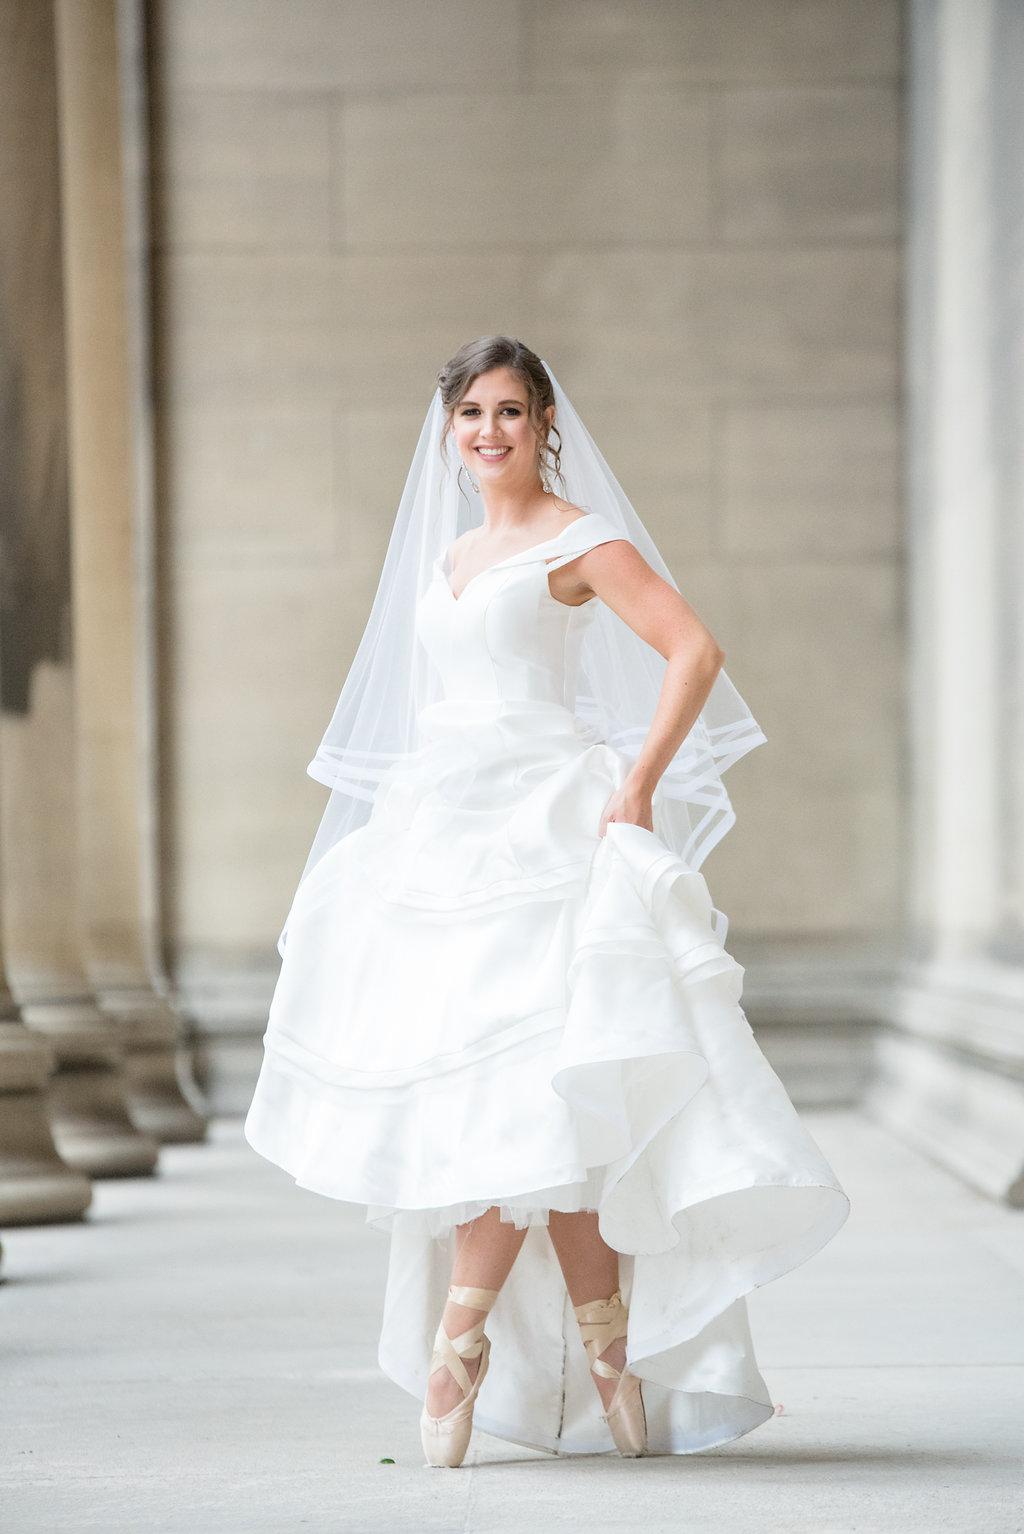 Ballerina Bride - Duquesne University Ballroom Wedding - Classic Wedding -- Wedding Blog - The Overwhelmed Bride